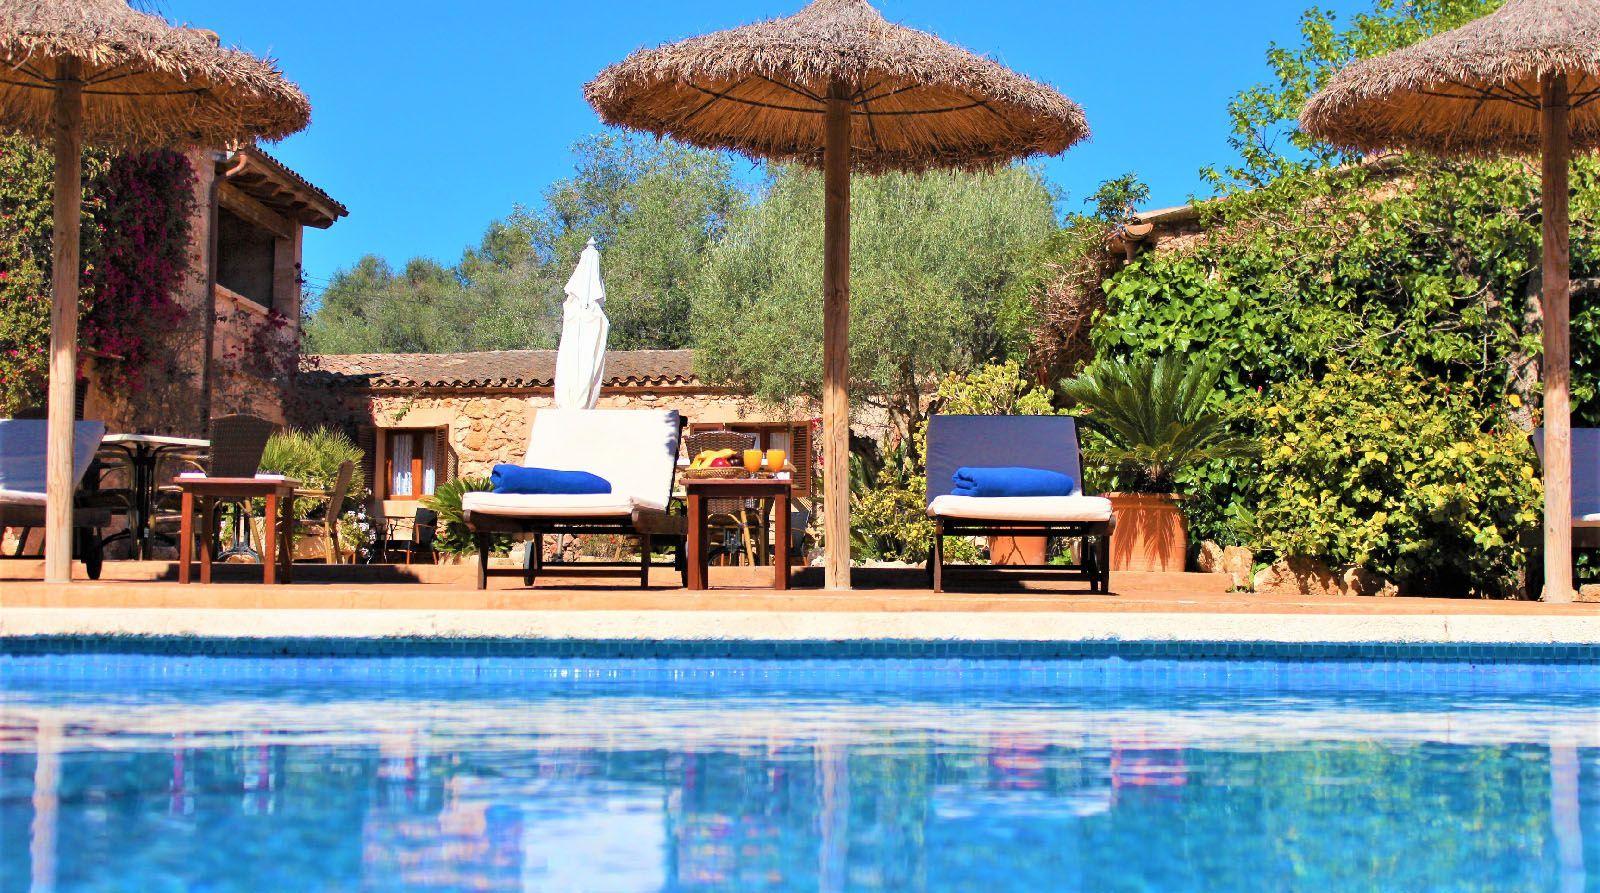 Finca Hotel Es Torrent · Agroturismo en Mallorca